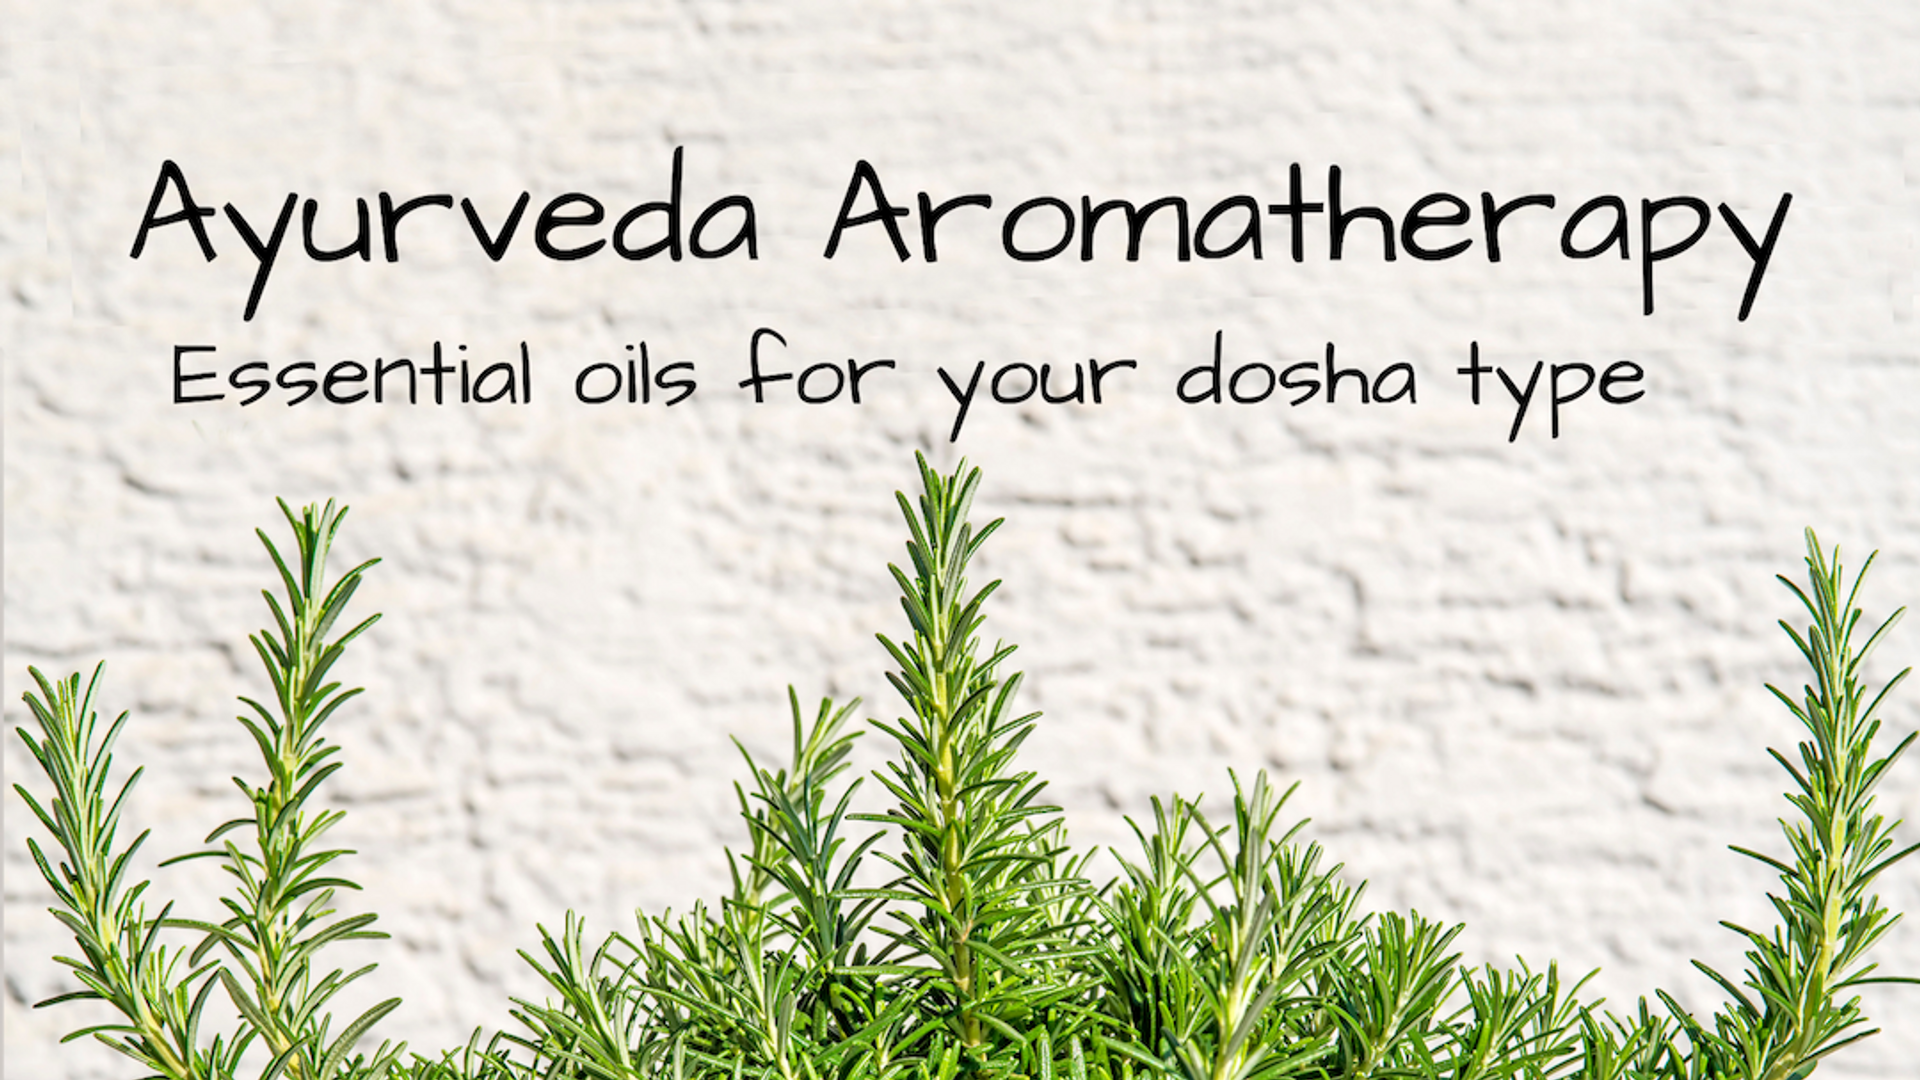 Essential oils Ayurveda